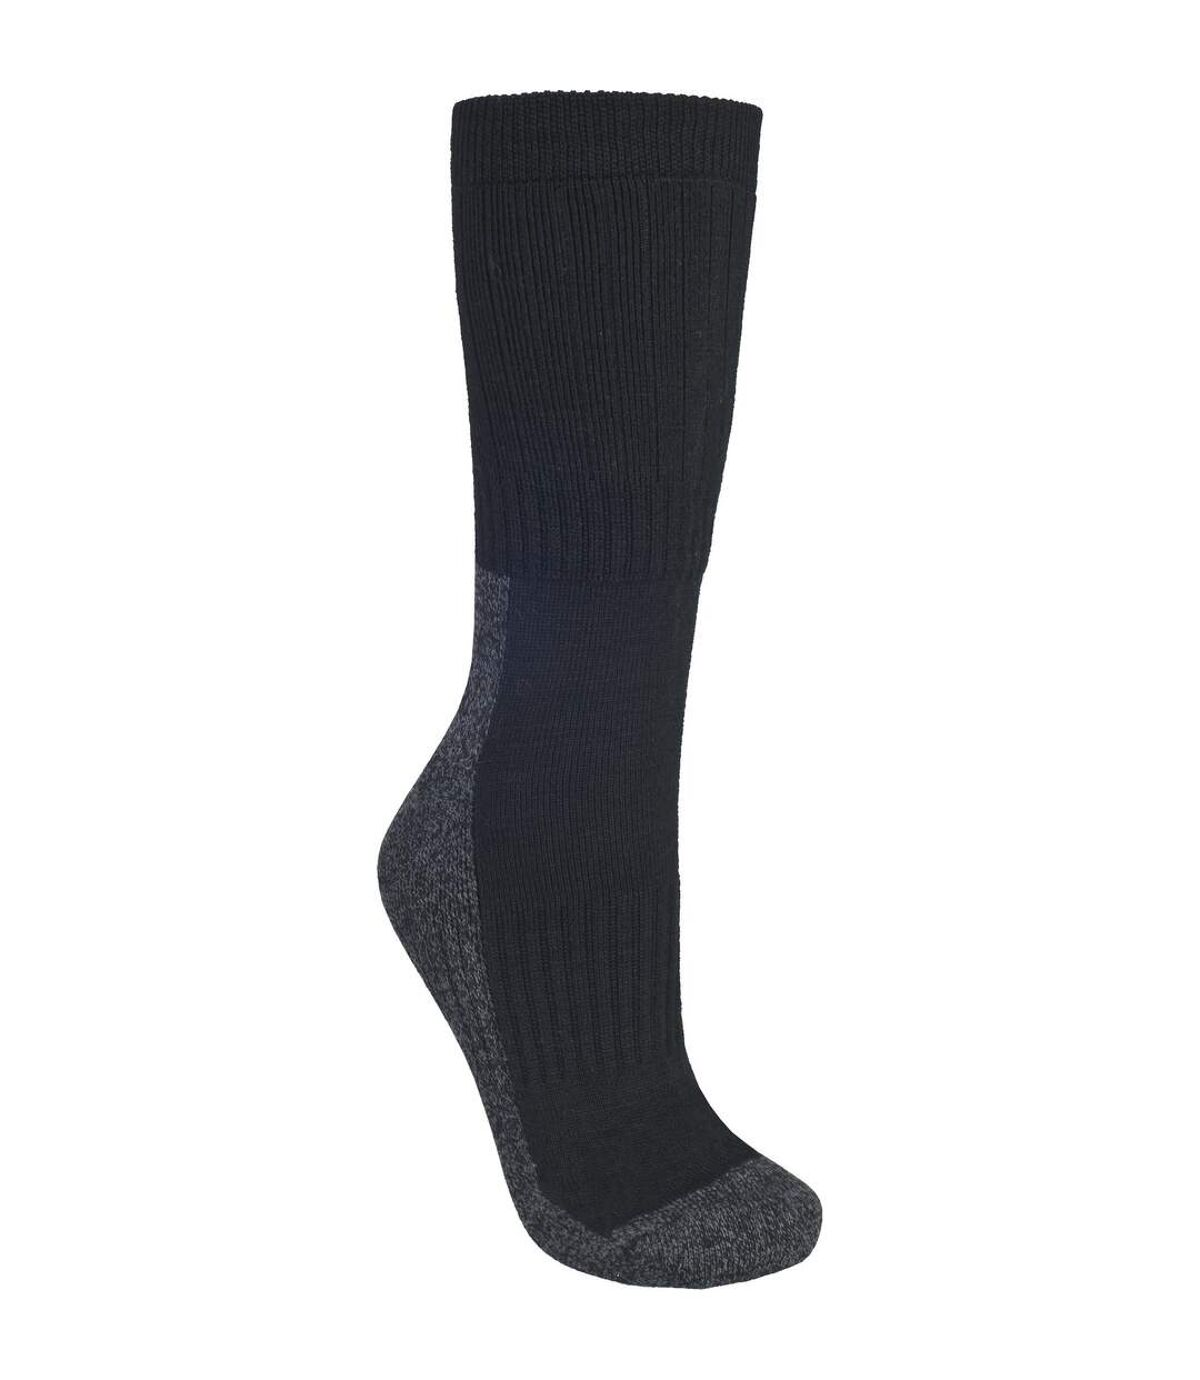 Trespass Mens Shak Lightweight Hiking Boot Socks (1 Pair) (Black) - UTTP321